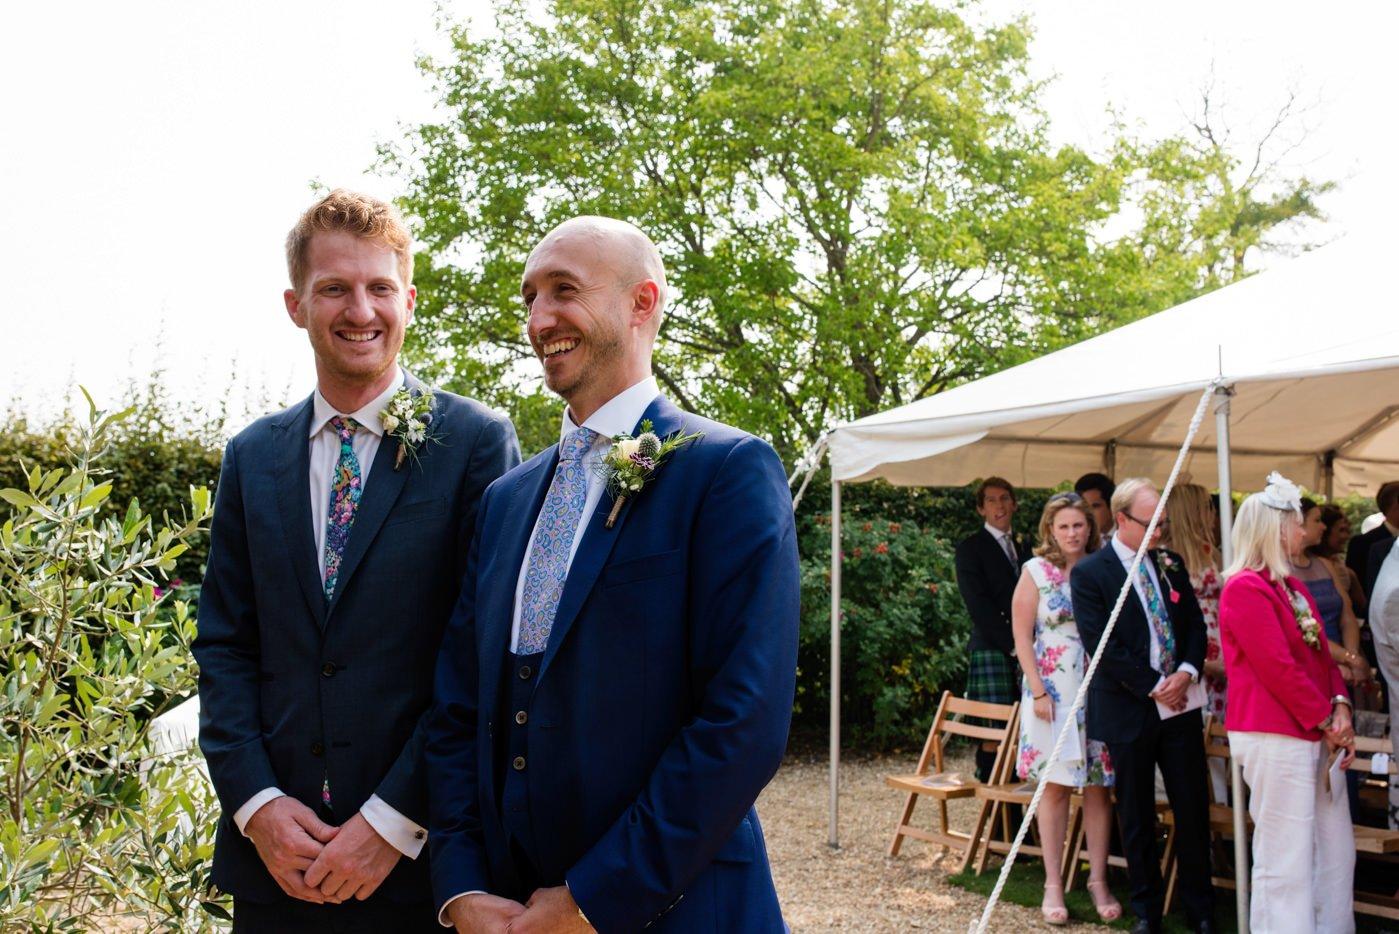 bignor-park-wedding-photography-robyn-and-tom-49